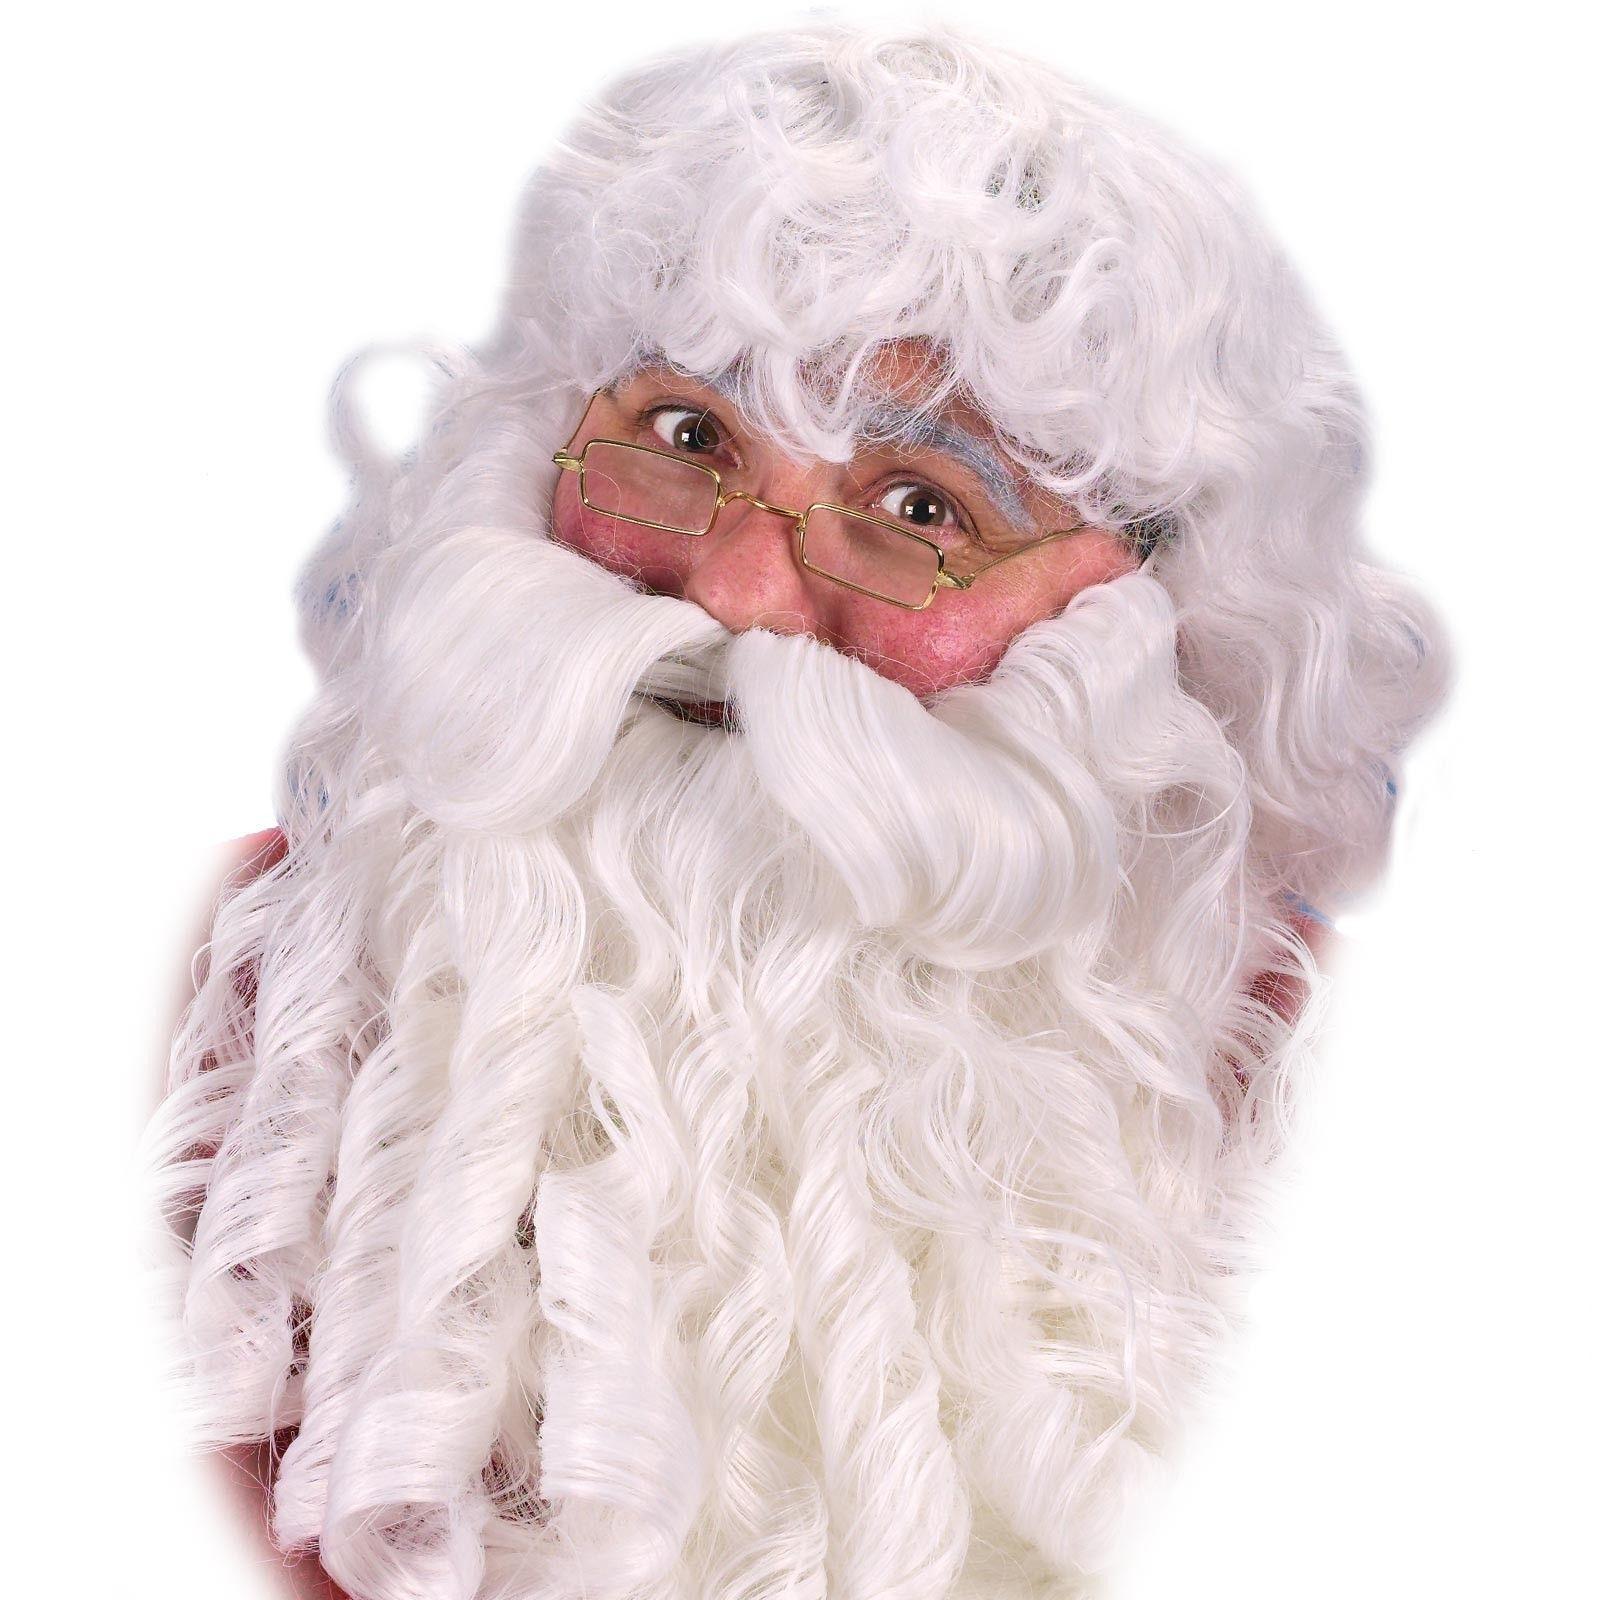 WIG BEARD MUSTACHE EYEBROWS SANTA SET CHRISTMAS FANCY DRESS COSTUME ACCESSORY